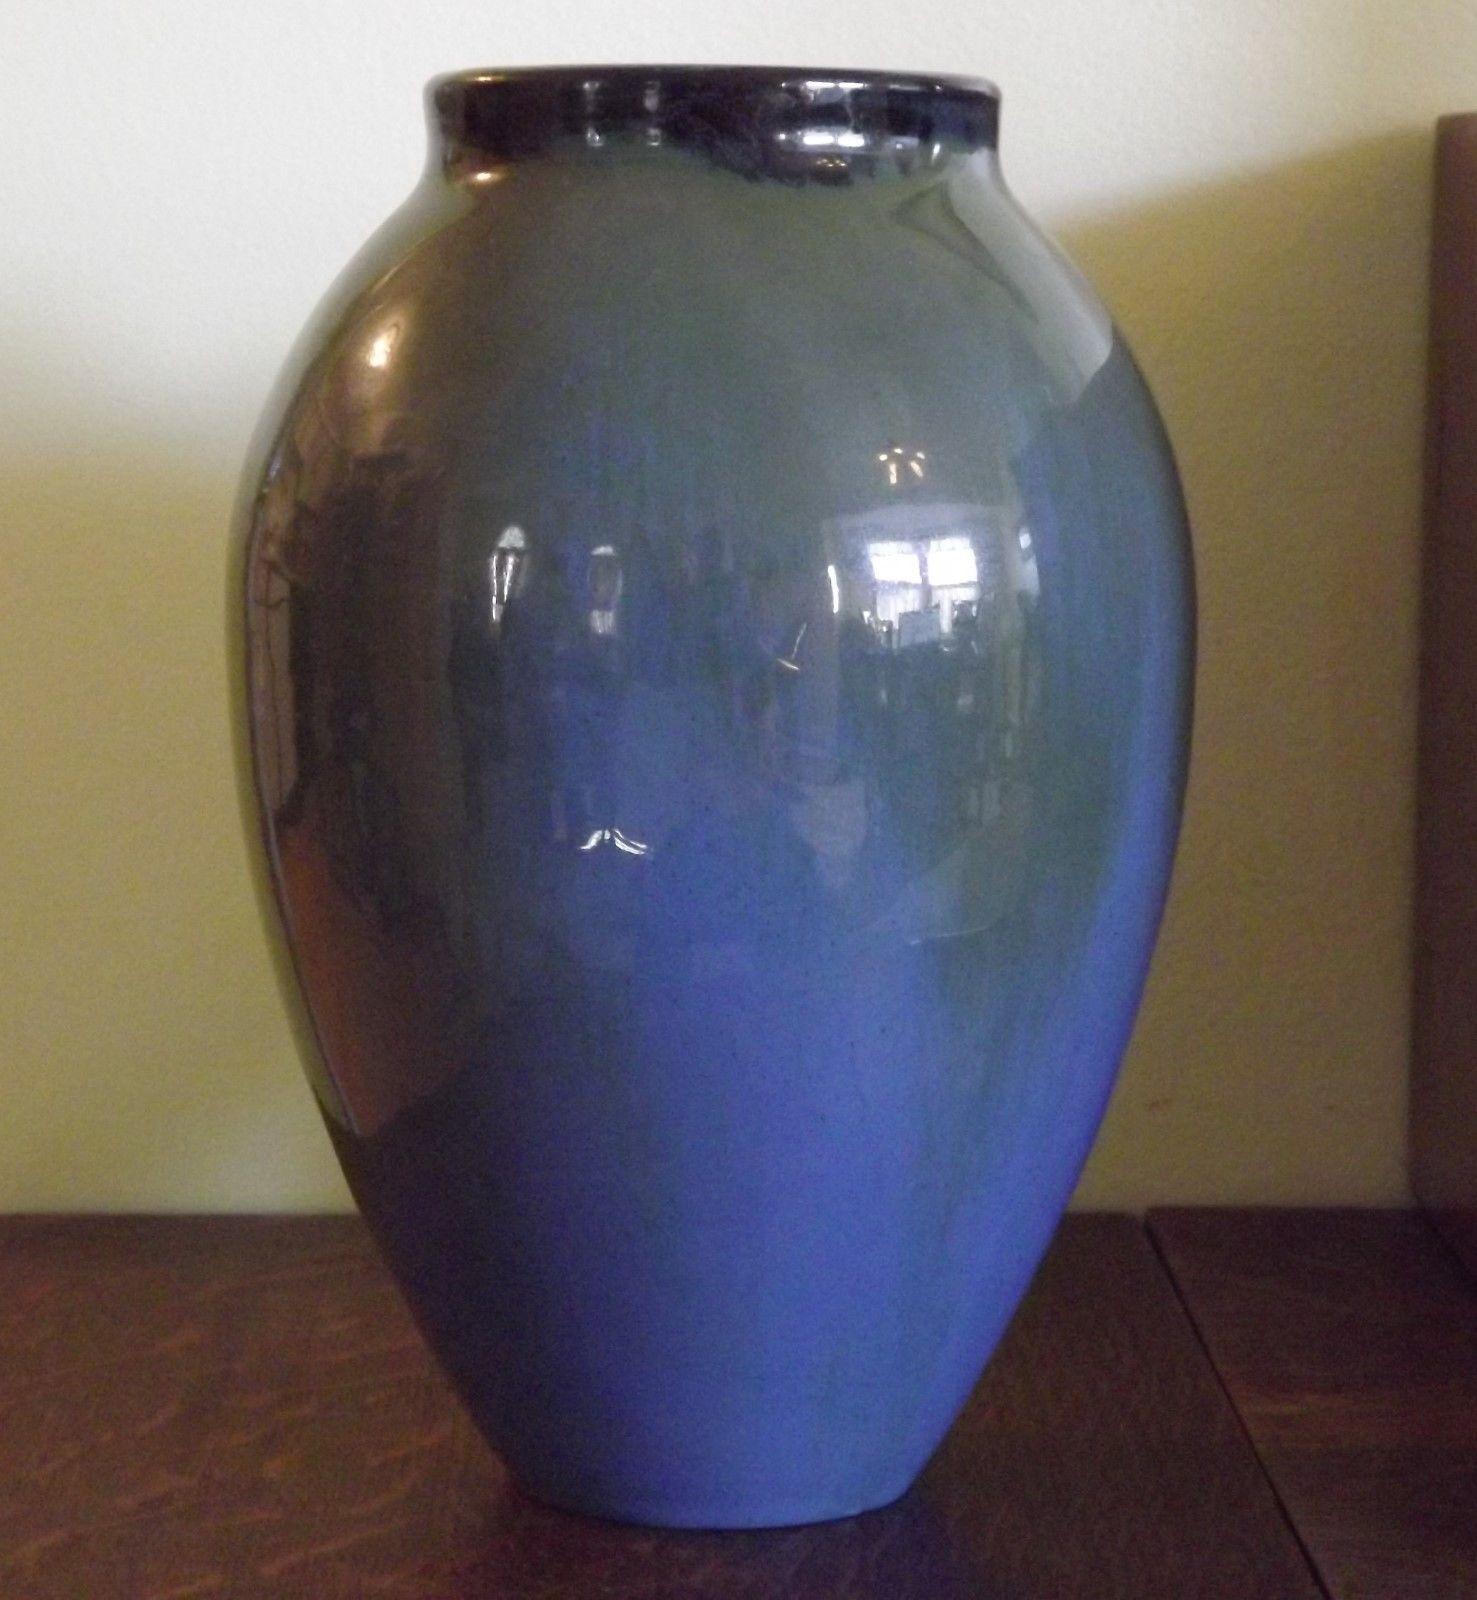 Fulper Pottery - Oblong Vase - Blue, Sea